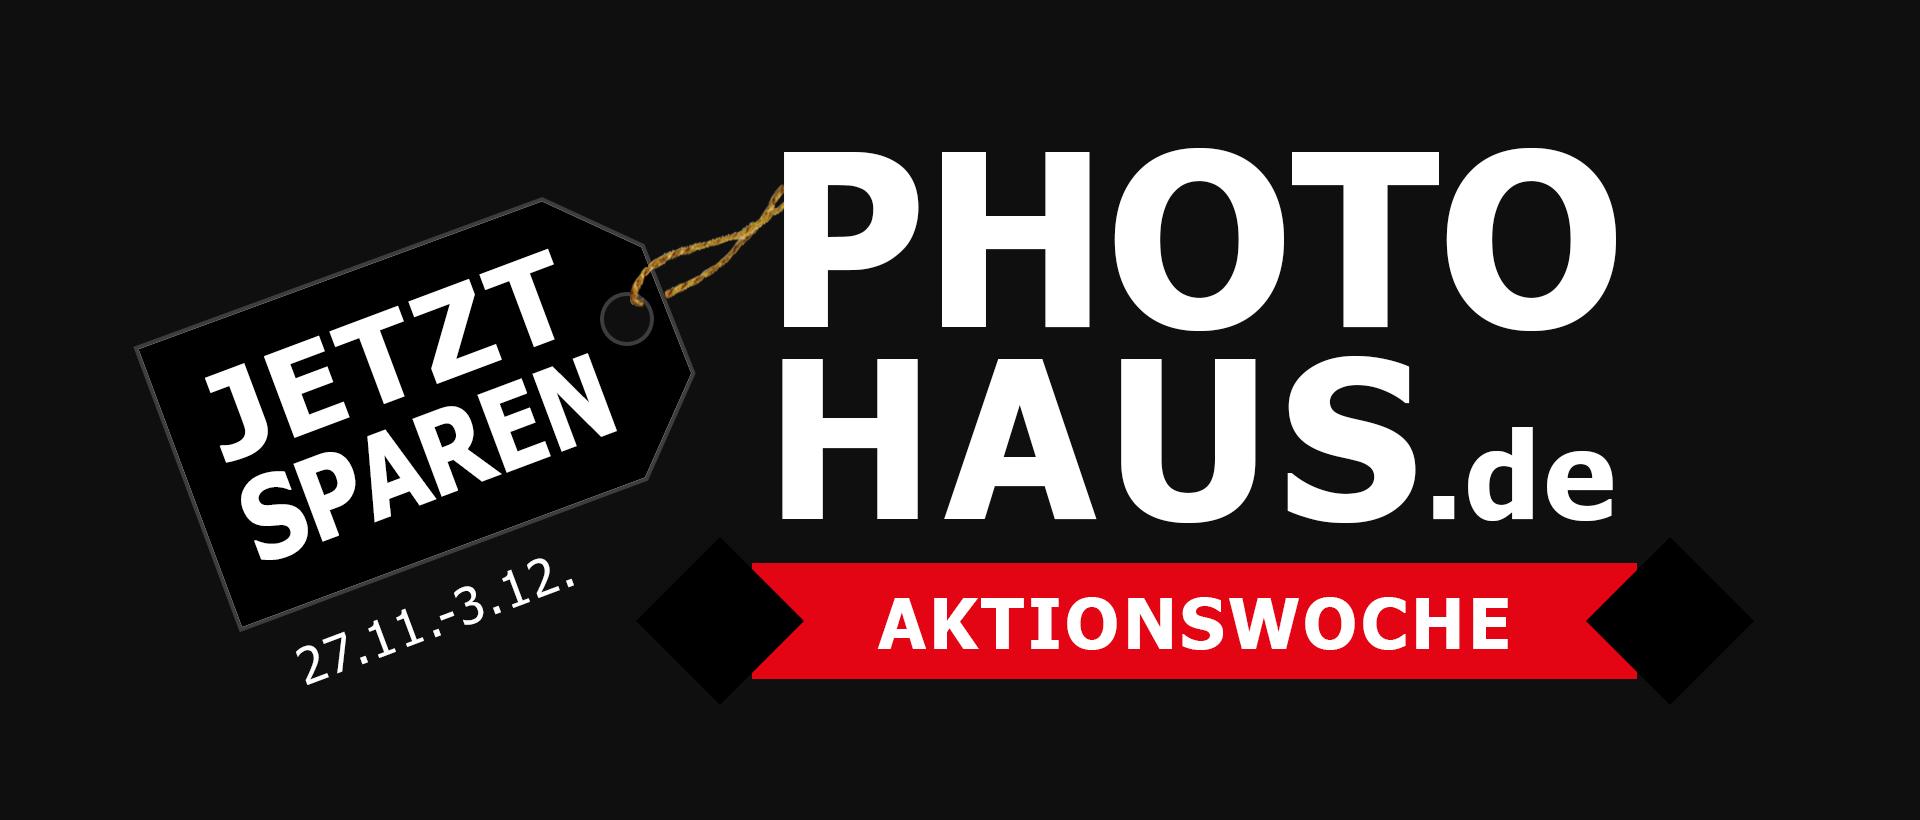 PHOTOHAUS.de Aktionswoche